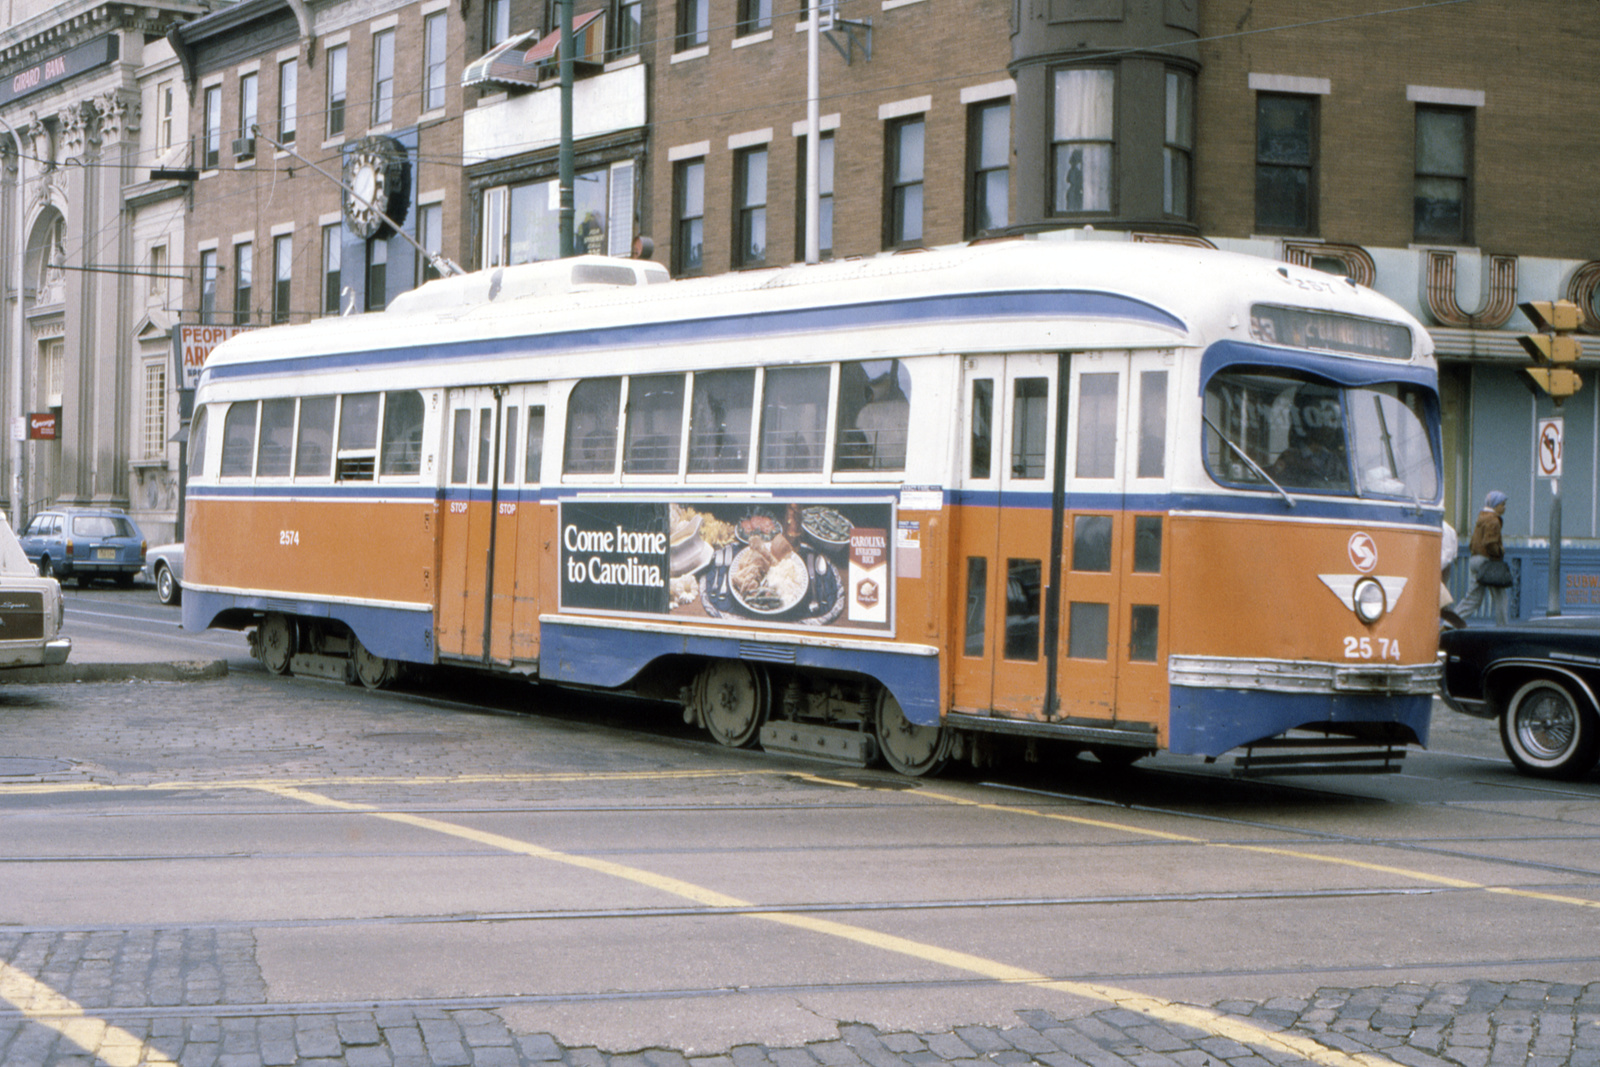 (773k, 1600x1067)<br><b>Country:</b> United States<br><b>City:</b> Philadelphia, PA<br><b>System:</b> SEPTA (or Predecessor)<br><b>Line:</b> Rt. 23-Germantown<br><b>Location:</b> Germantown/Broad/Erie<br><b>Car:</b> PTC/SEPTA Pre-war Air-car PCC (St.Louis, 1940) 2574 <br><b>Collection of:</b> David Pirmann<br><b>Date:</b> 12/1980<br><b>Viewed (this week/total):</b> 0 / 52